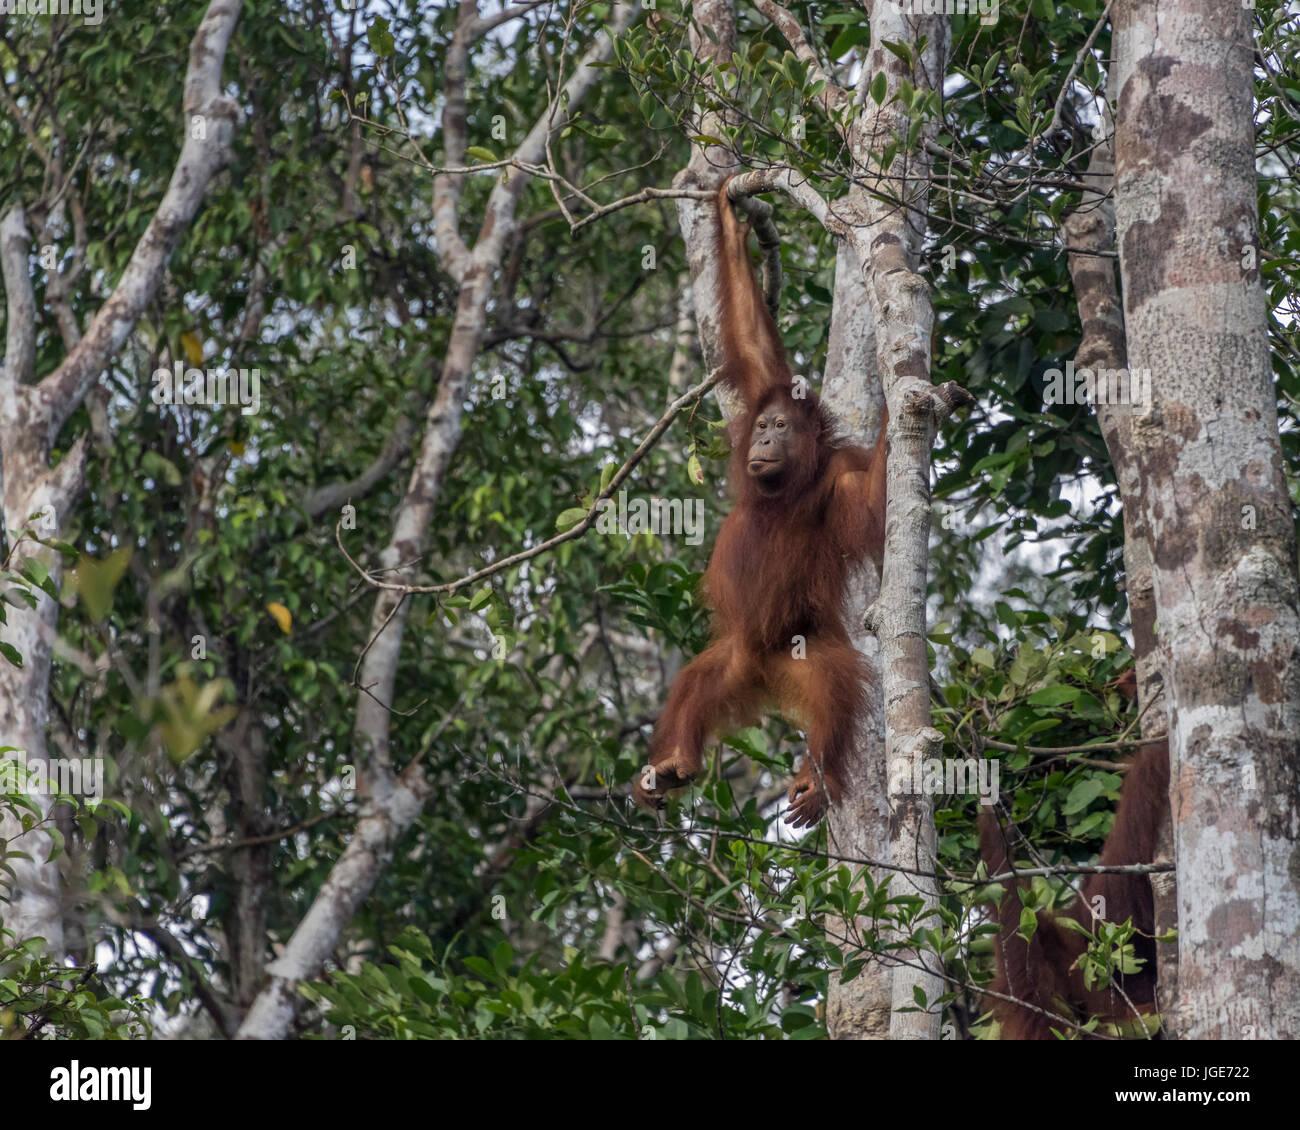 Young orangutan swinging in the trees, Tanjung Puting National Park, Kalimantan, Indonesia - Stock Image